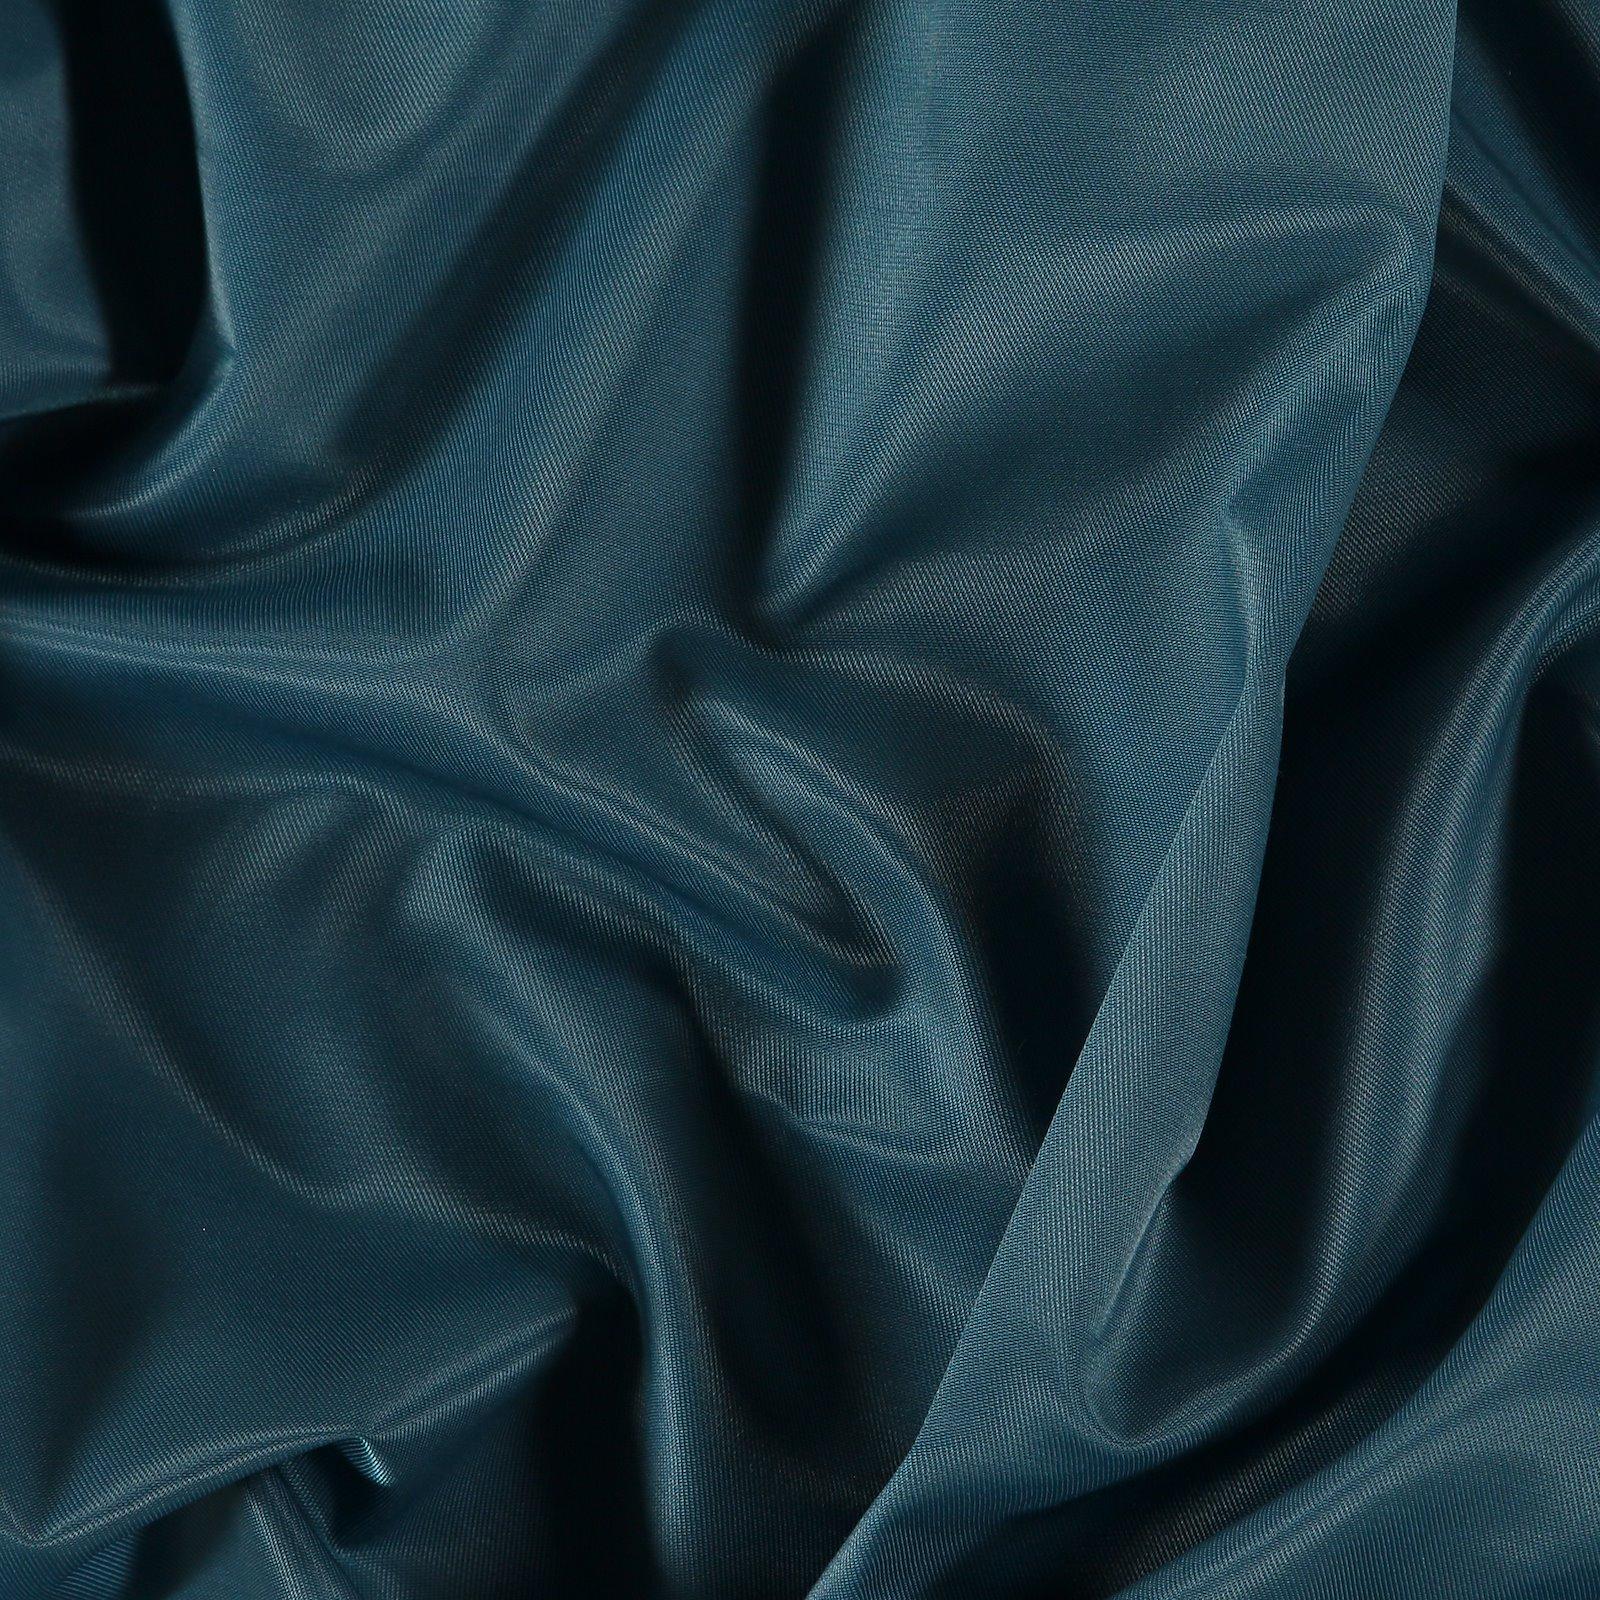 Beaver nylon bright petrol blue